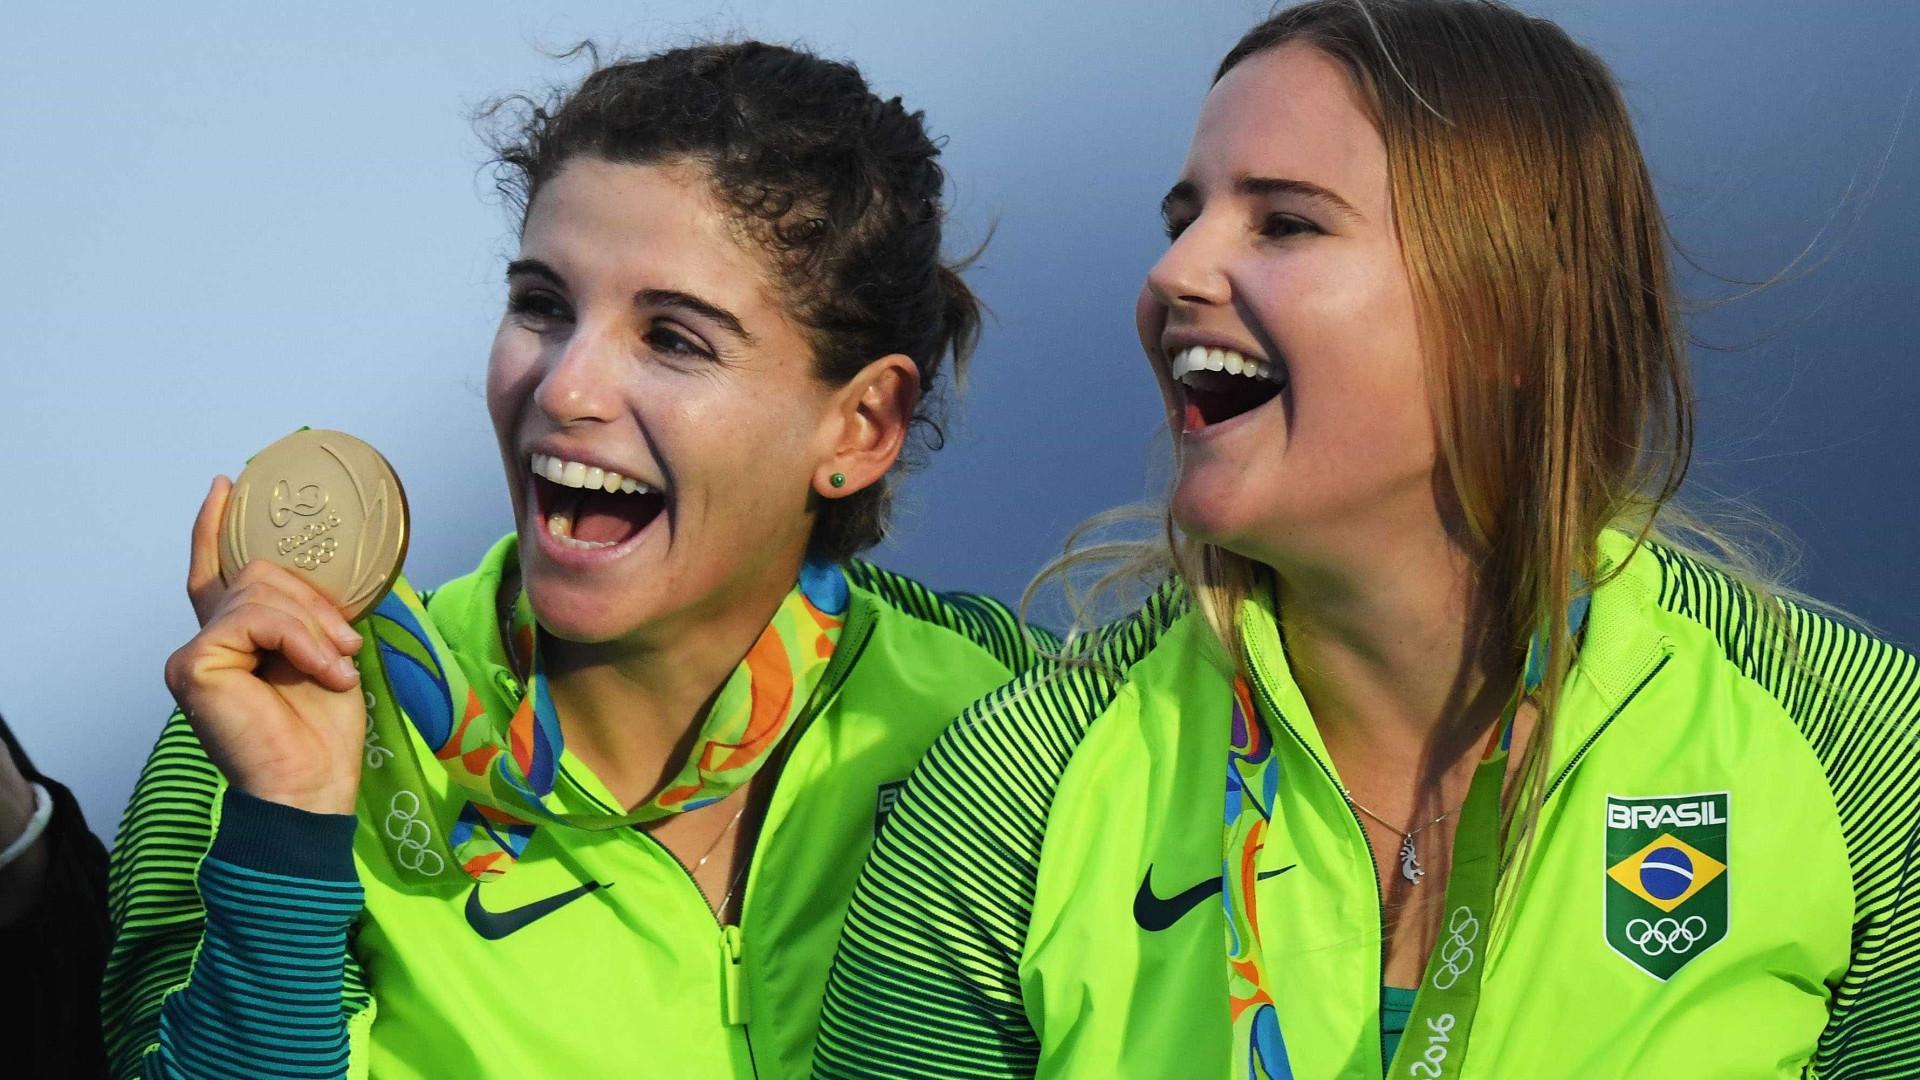 Legado? Ouro no Rio, velejadora diz que Baía de Guanabara 'piorou'